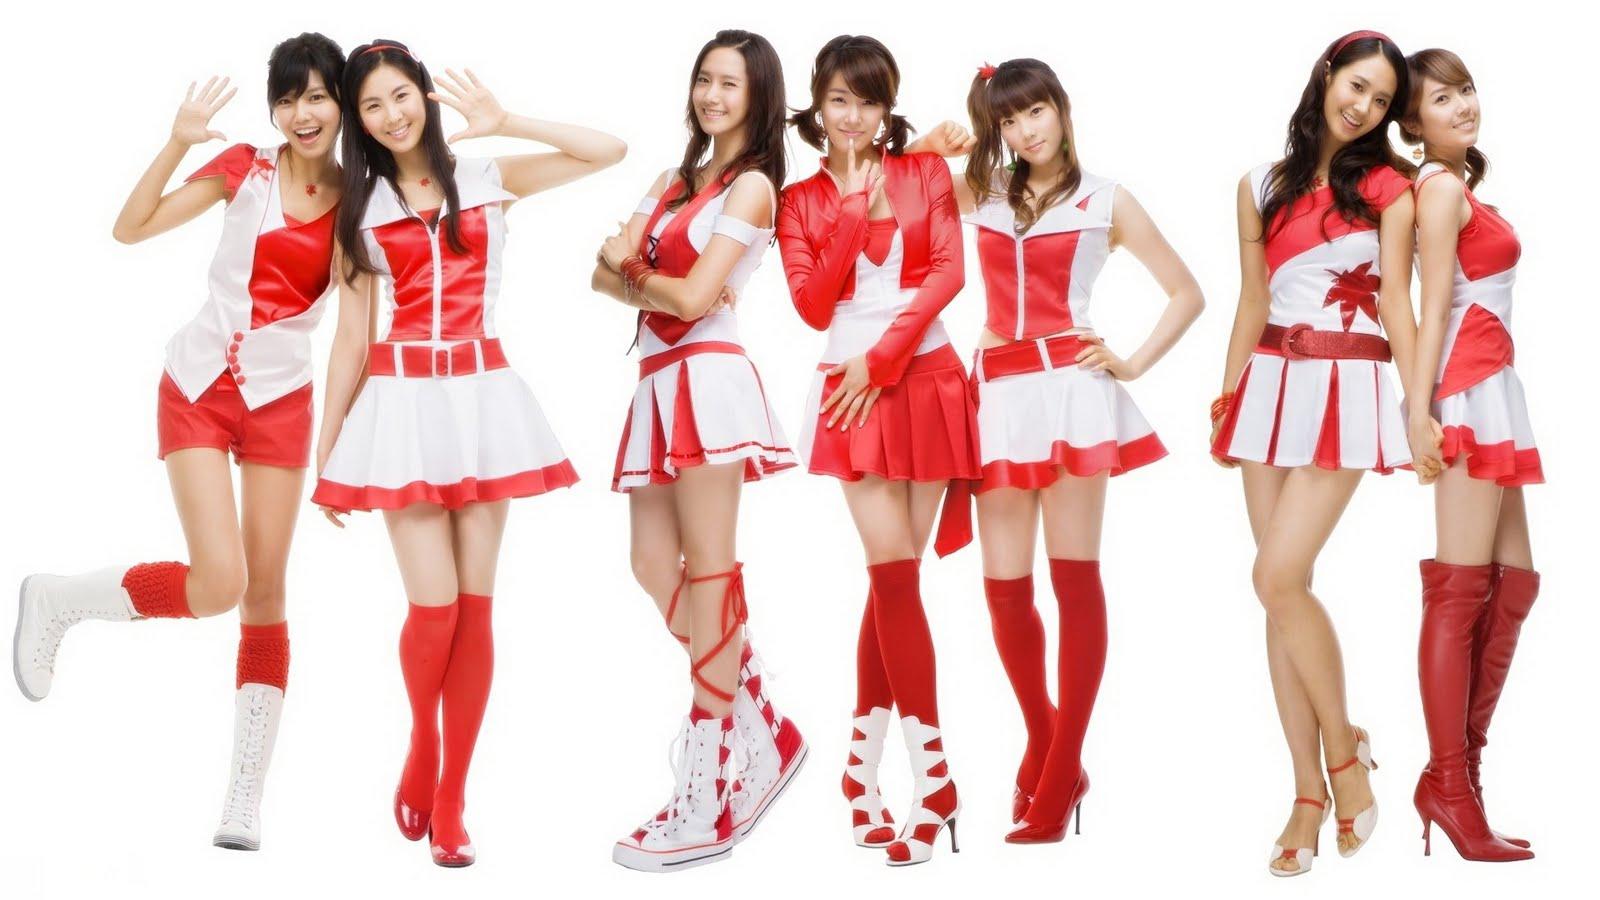 Sexy asian cheerleaders wallpaper hd The Wallpaper Database 1600x900